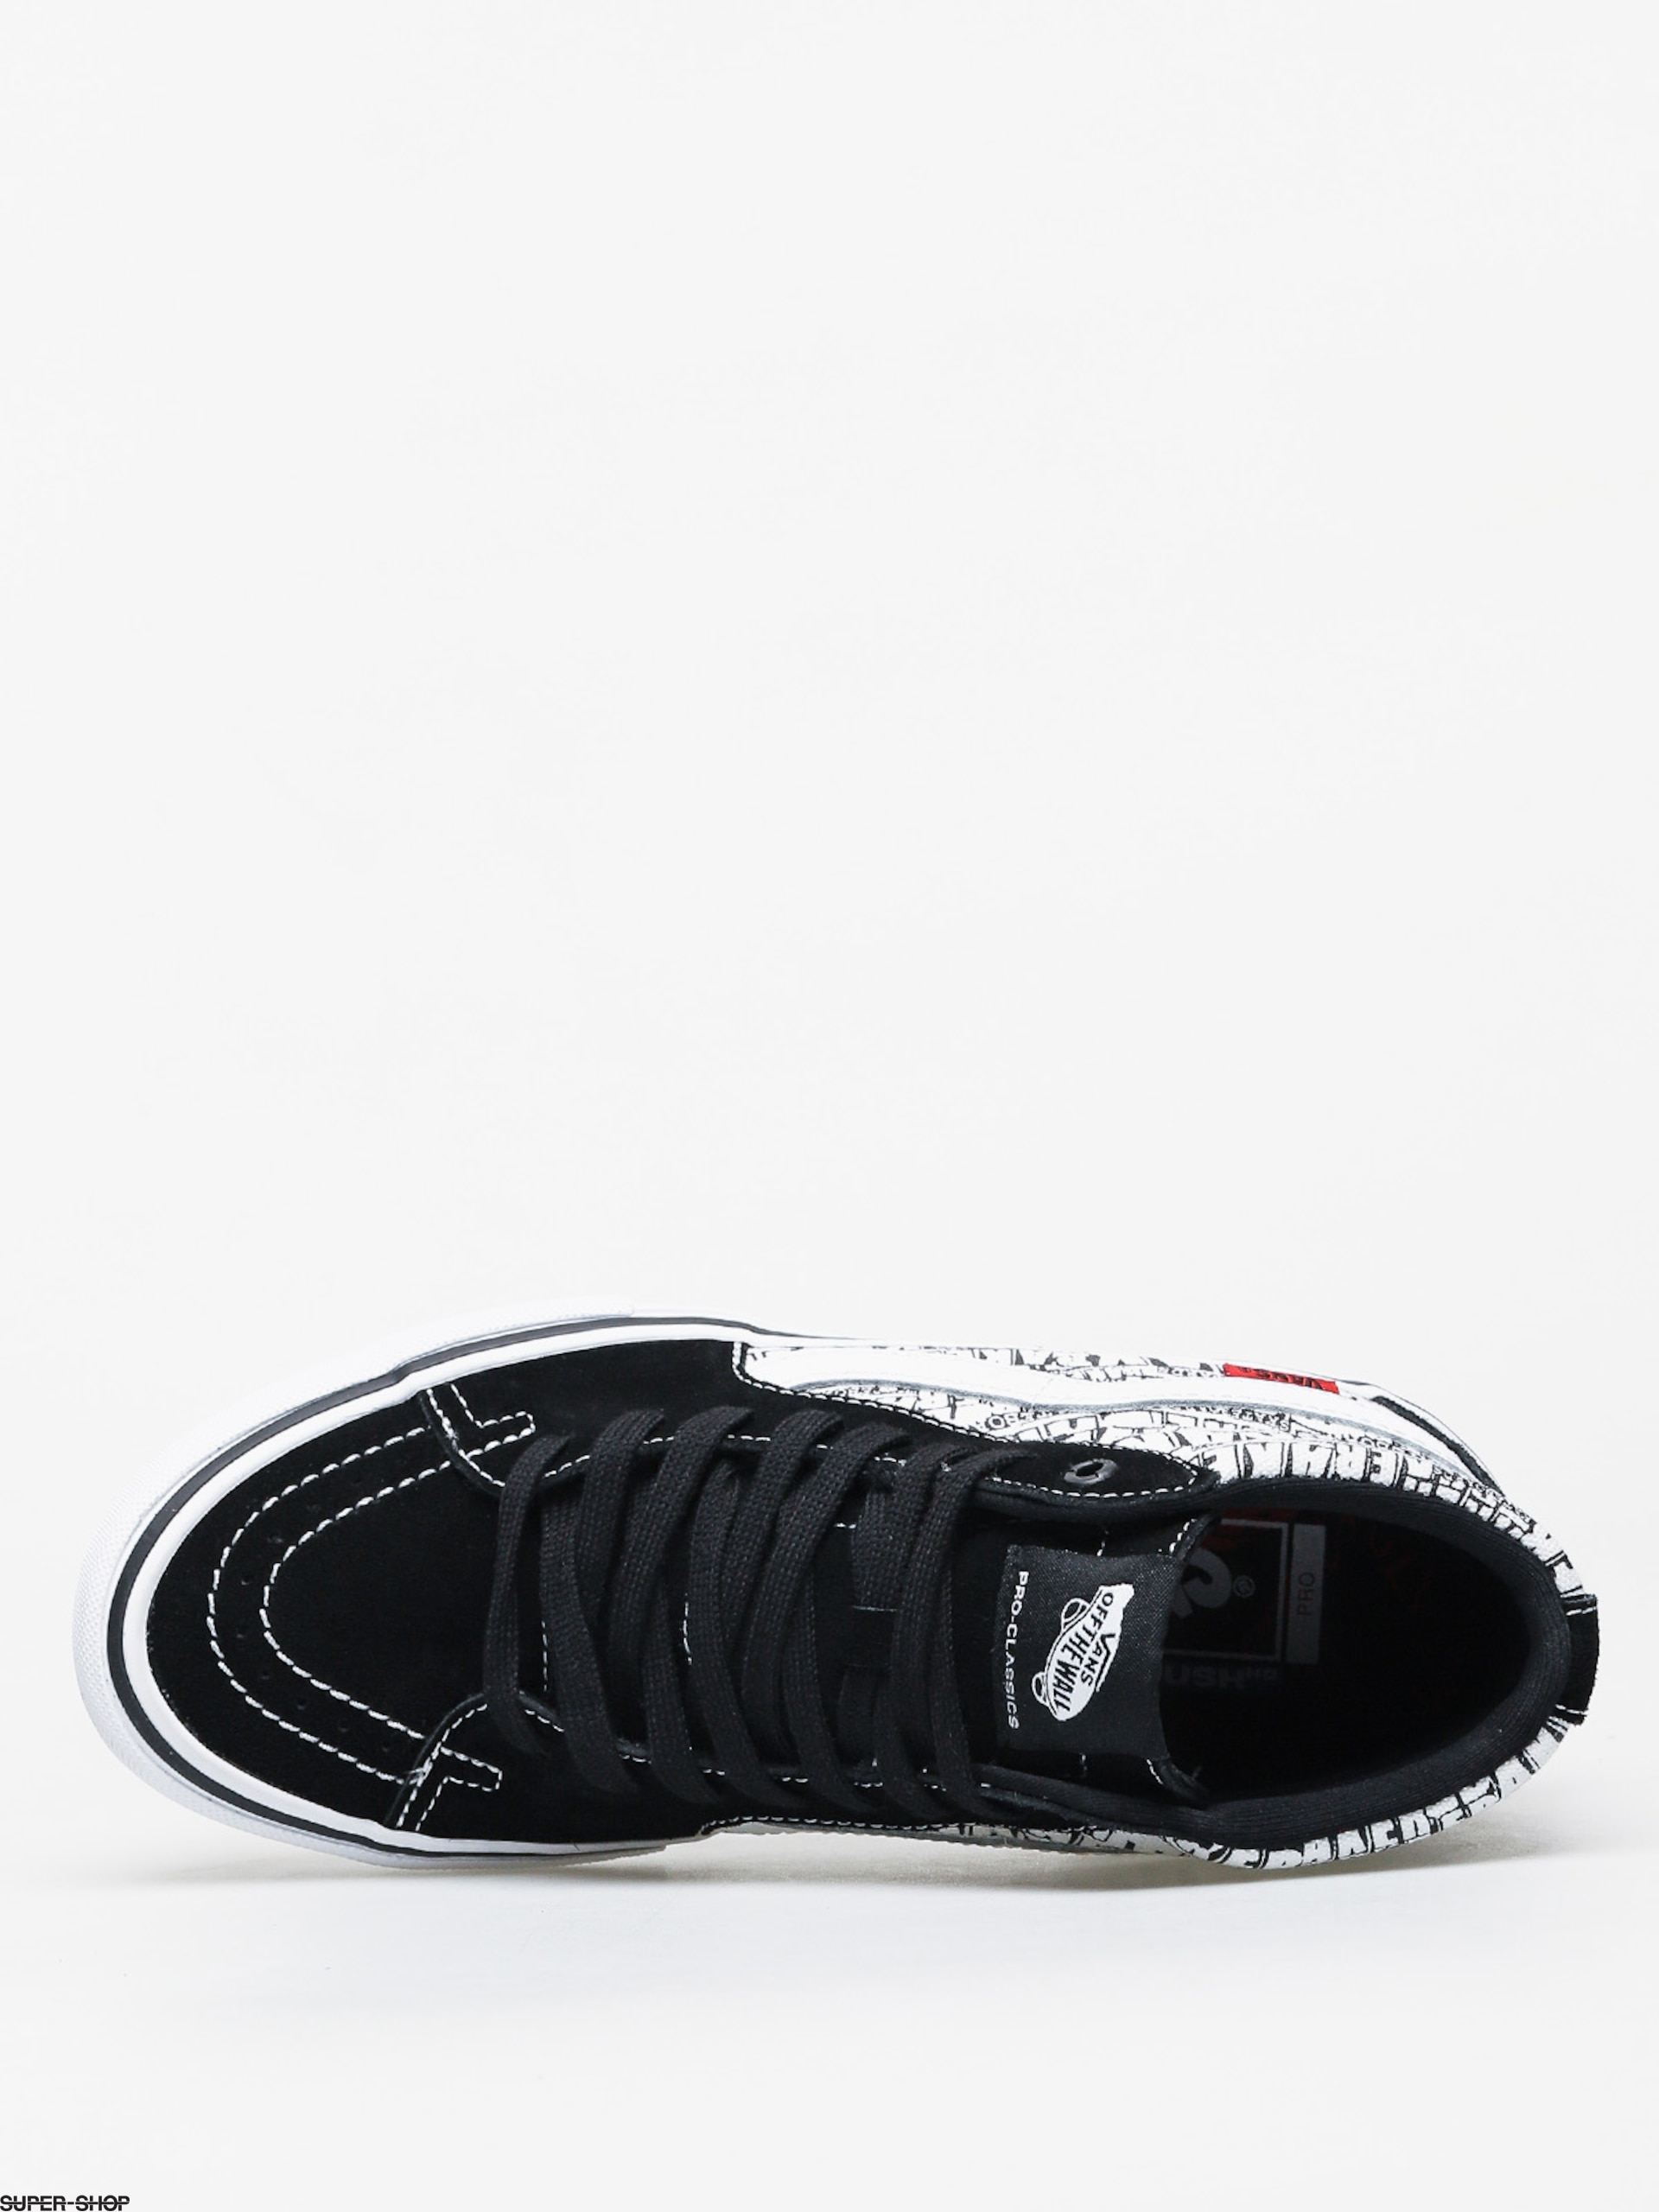 Vans X Baker Sk8 Hi Pro Shoes (blackwhite)